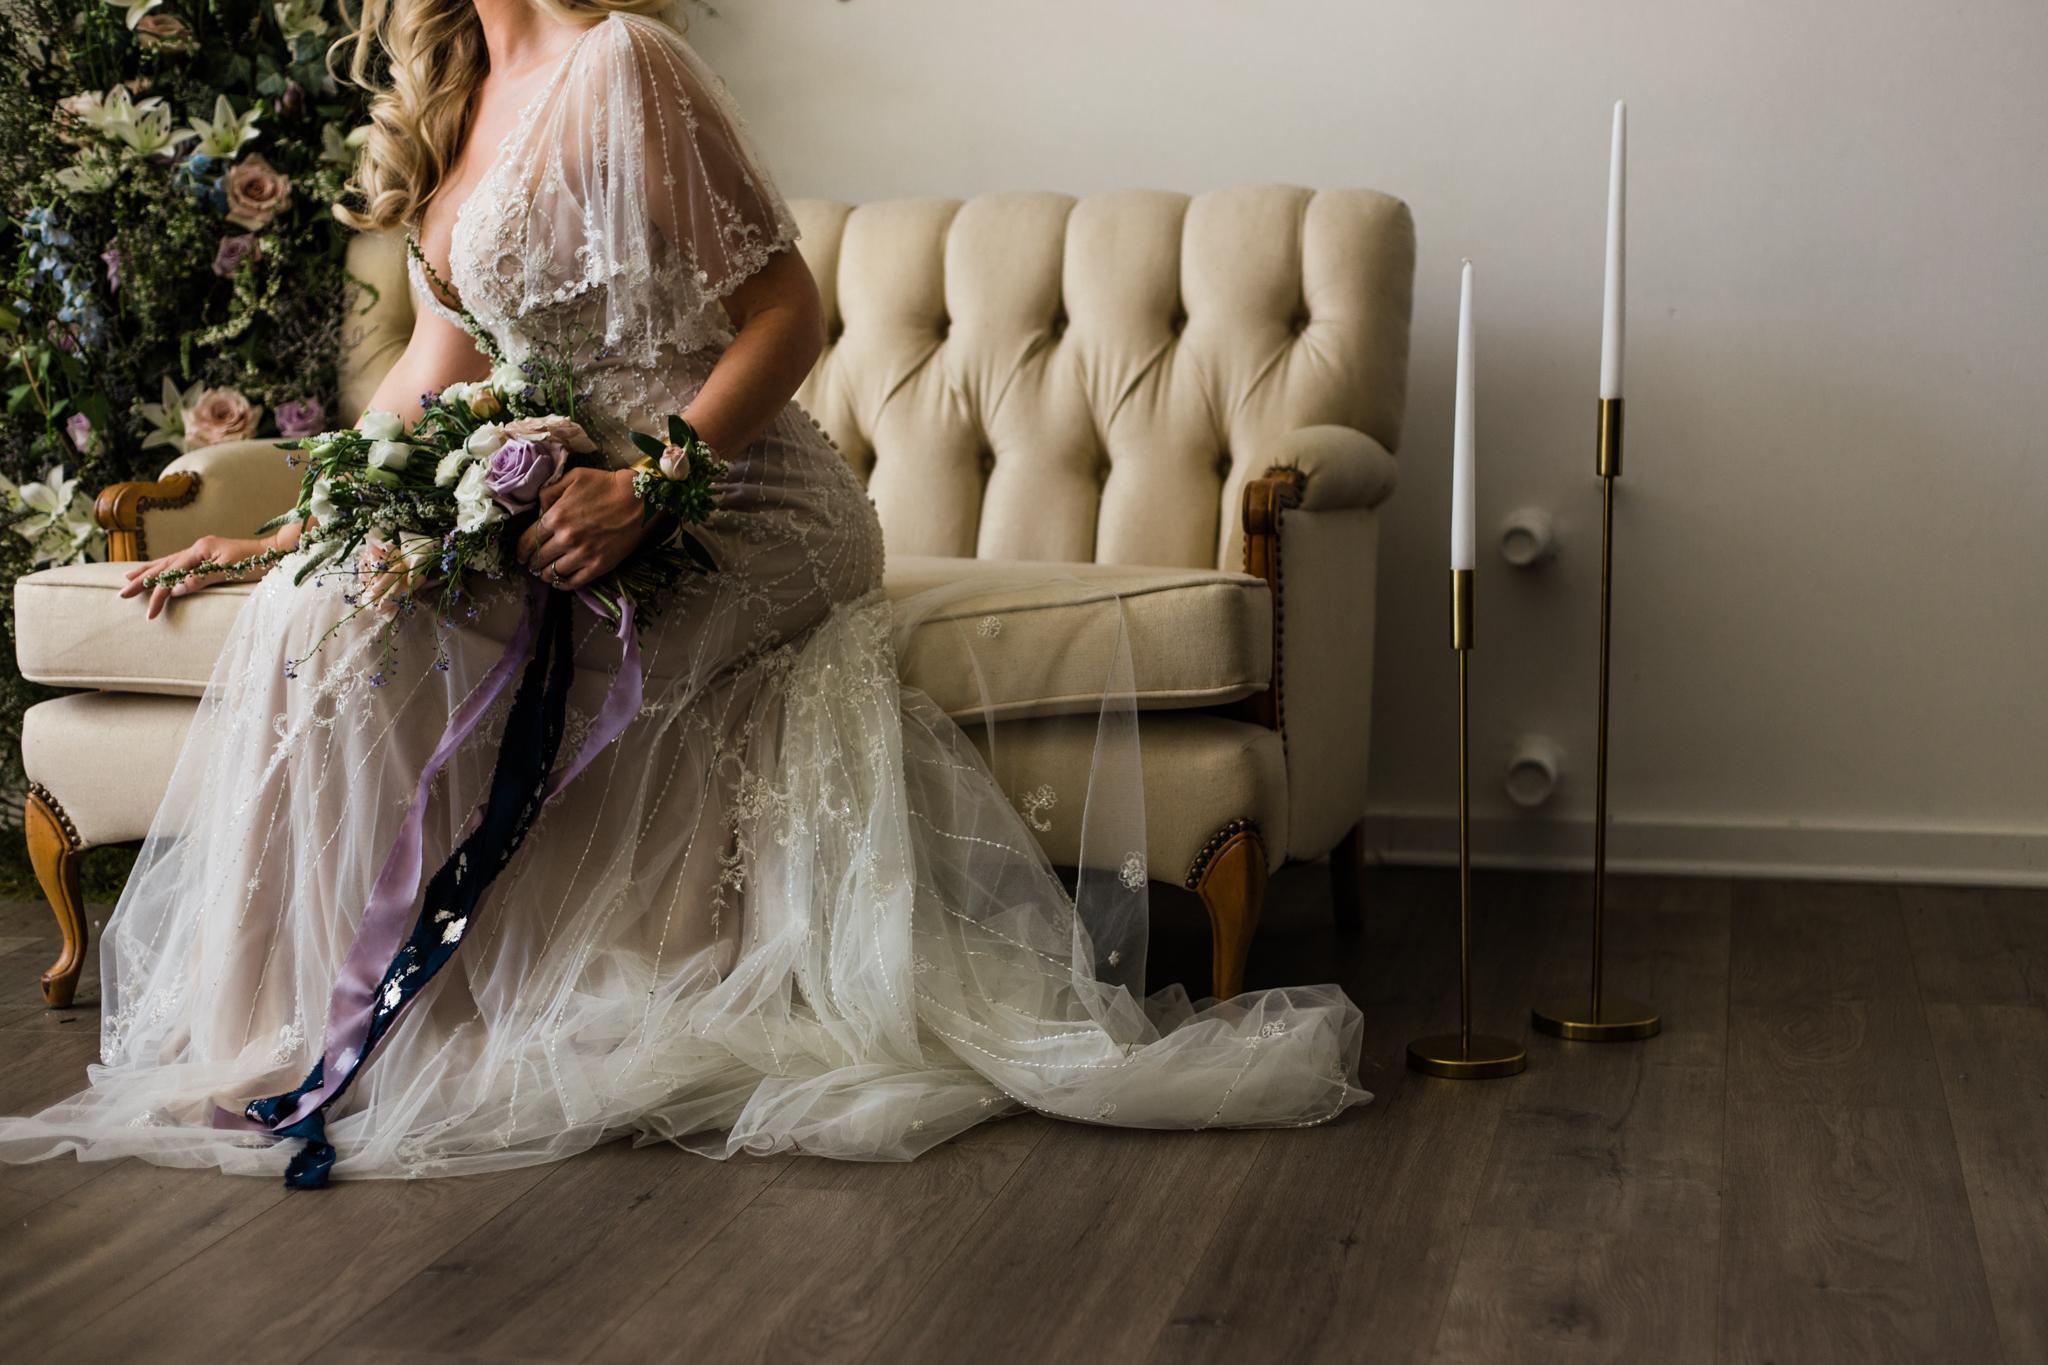 Lightroom PDX - Portland OR - Malina Rose Photography-2.jpg